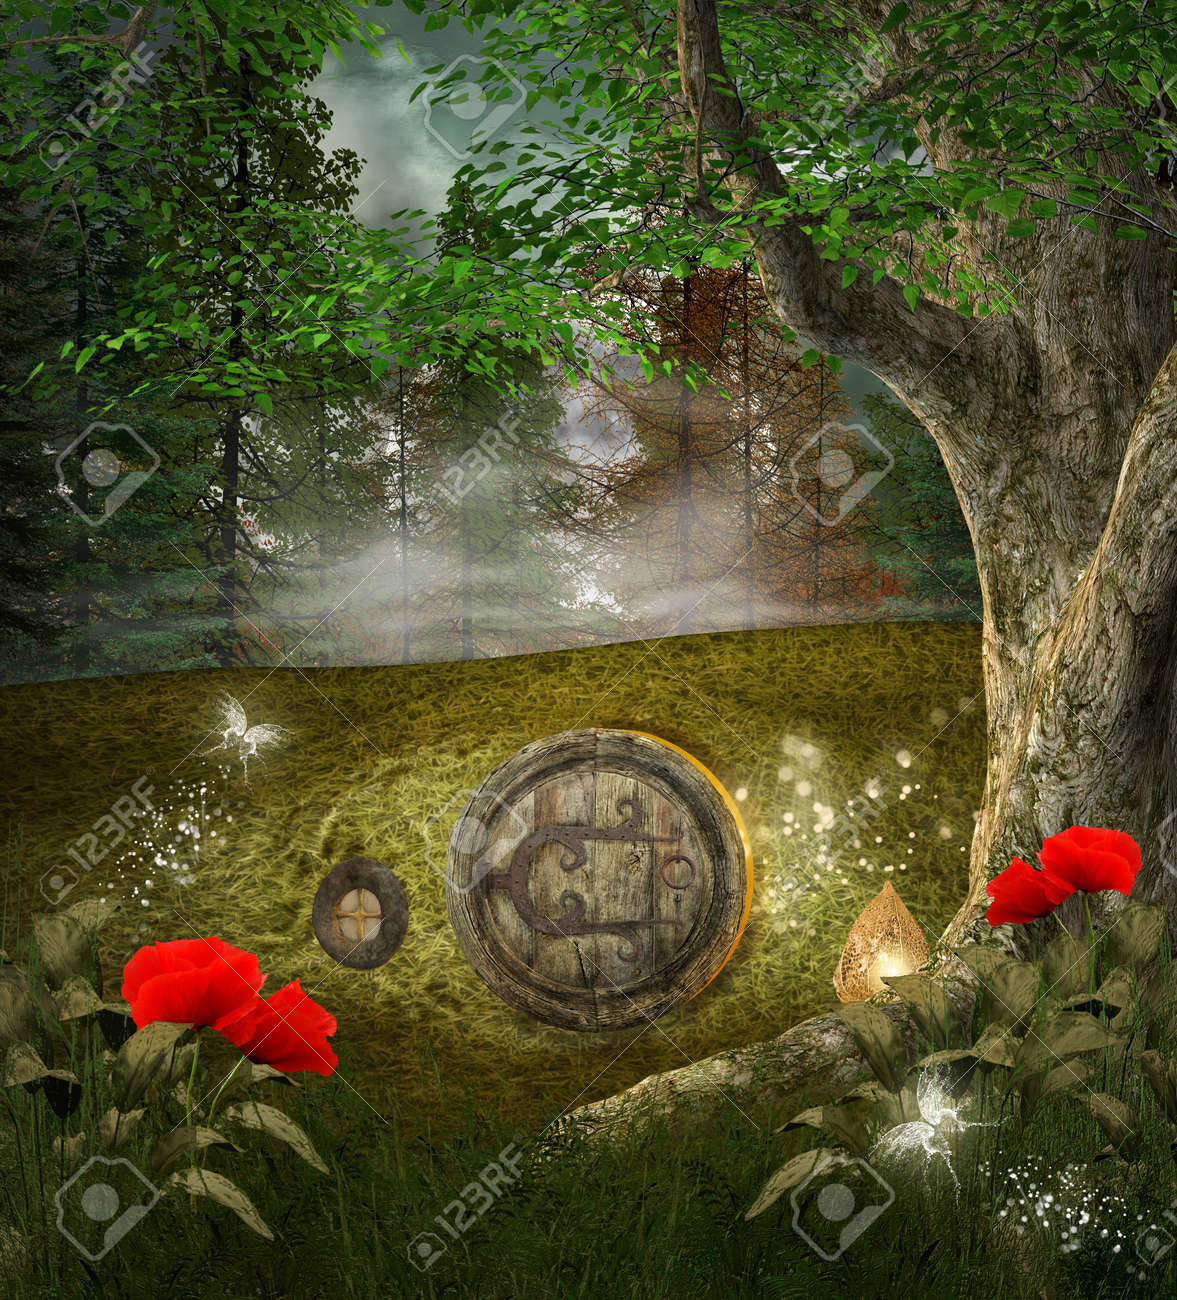 Midsummer night dream series - elves house Stock Photo - 16294925